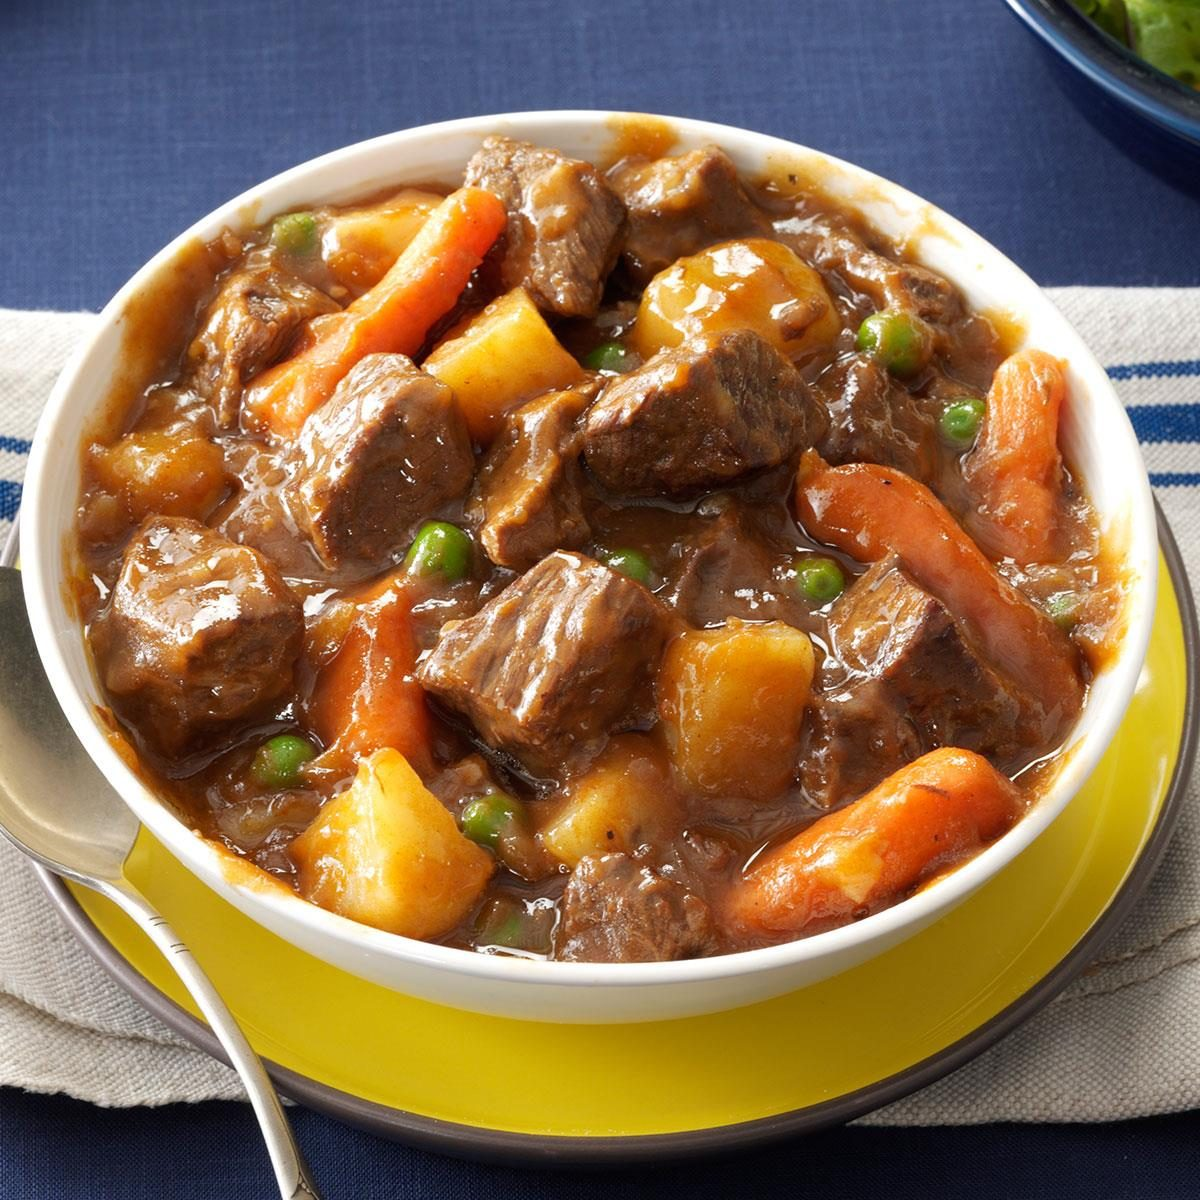 49: Slow Cooker Beef Vegetable Stew